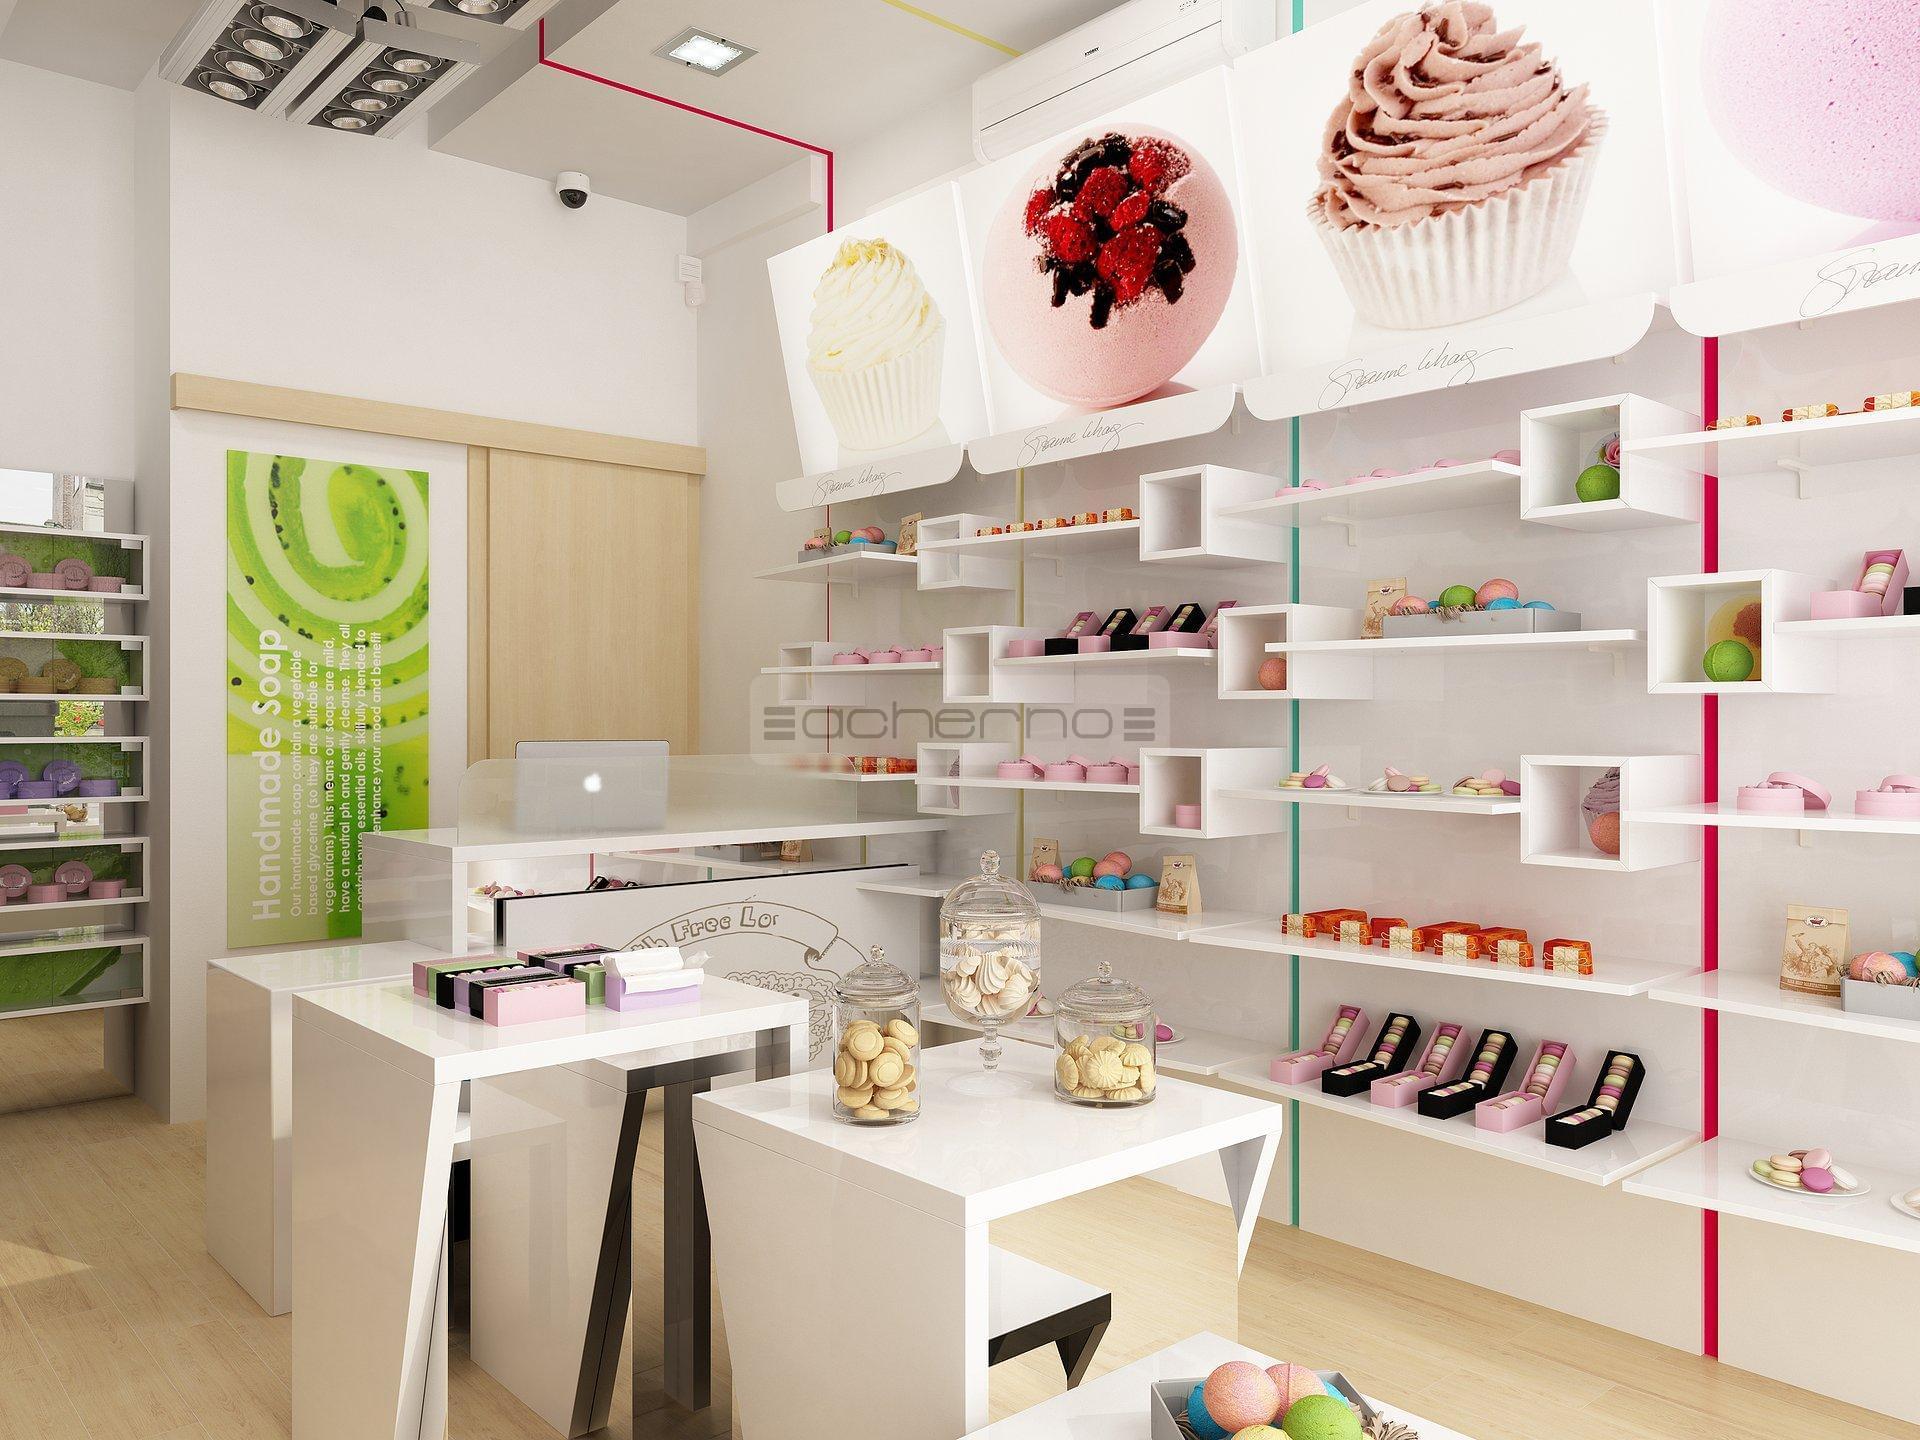 Acherno raumgestaltung ladengesch ft boom for Raumgestaltung cafe